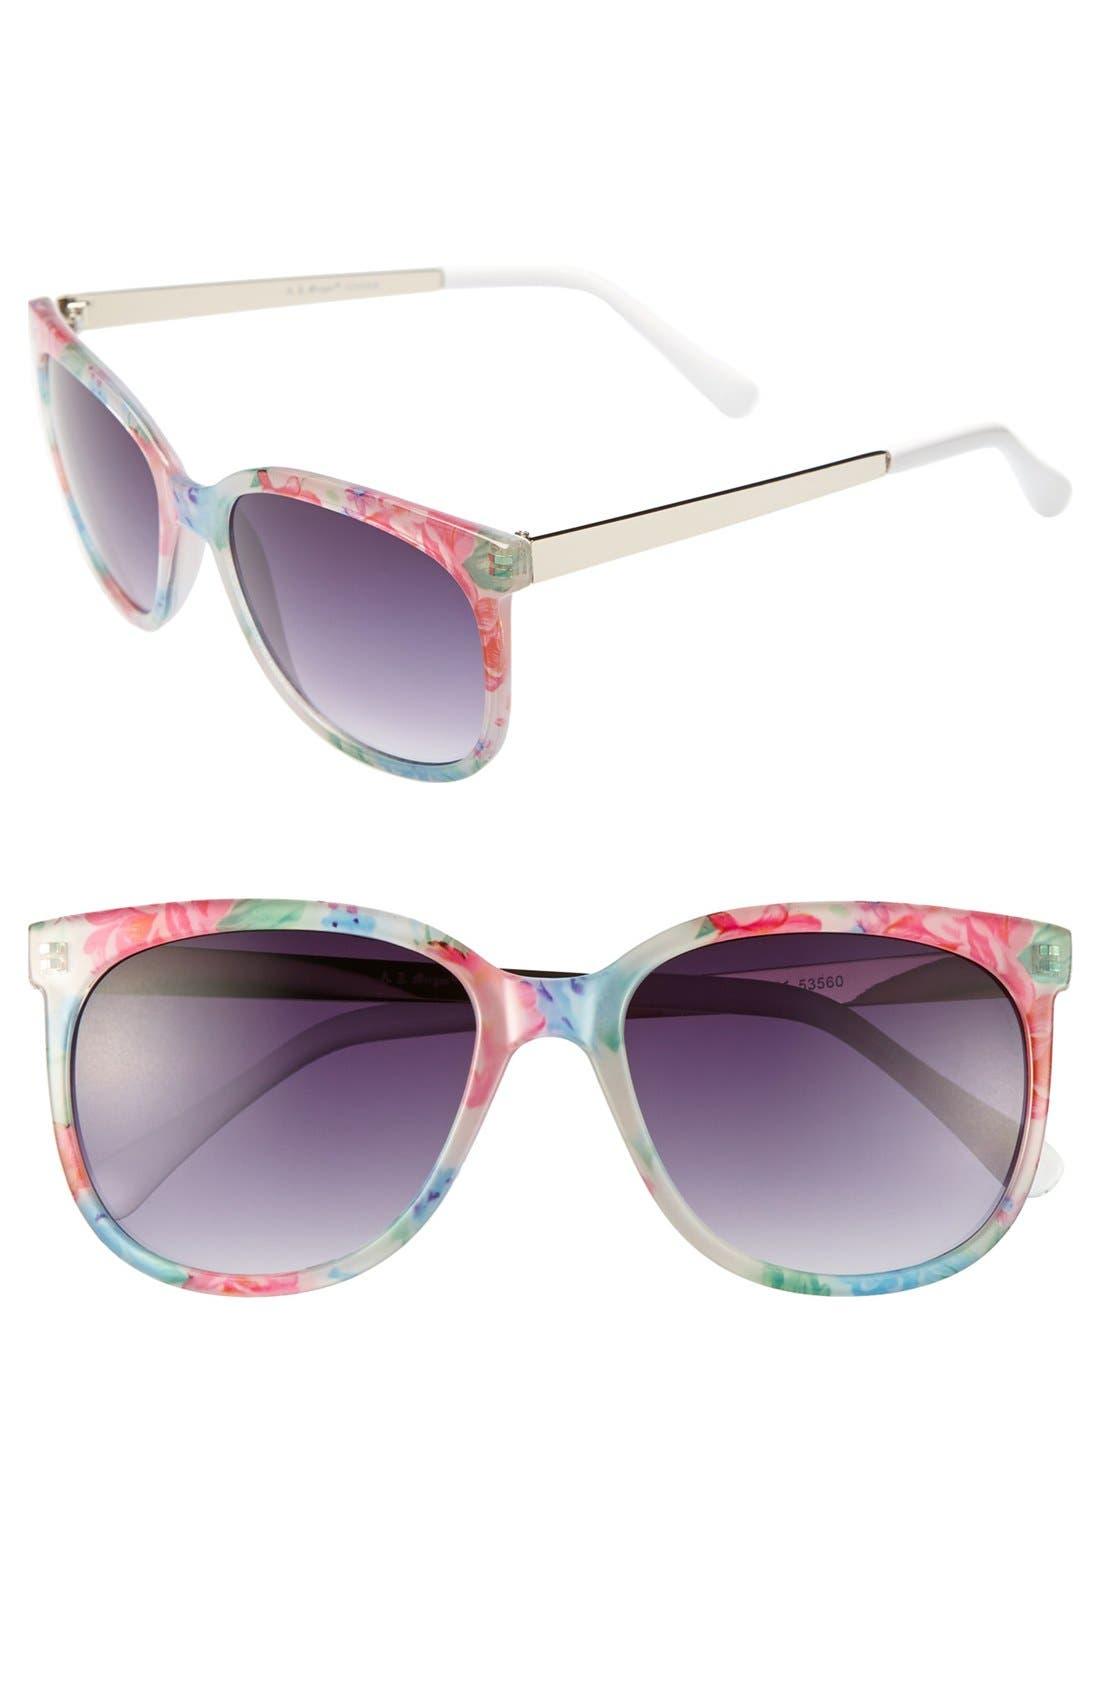 Main Image - A.J. Morgan 'Mirage' Sunglasses